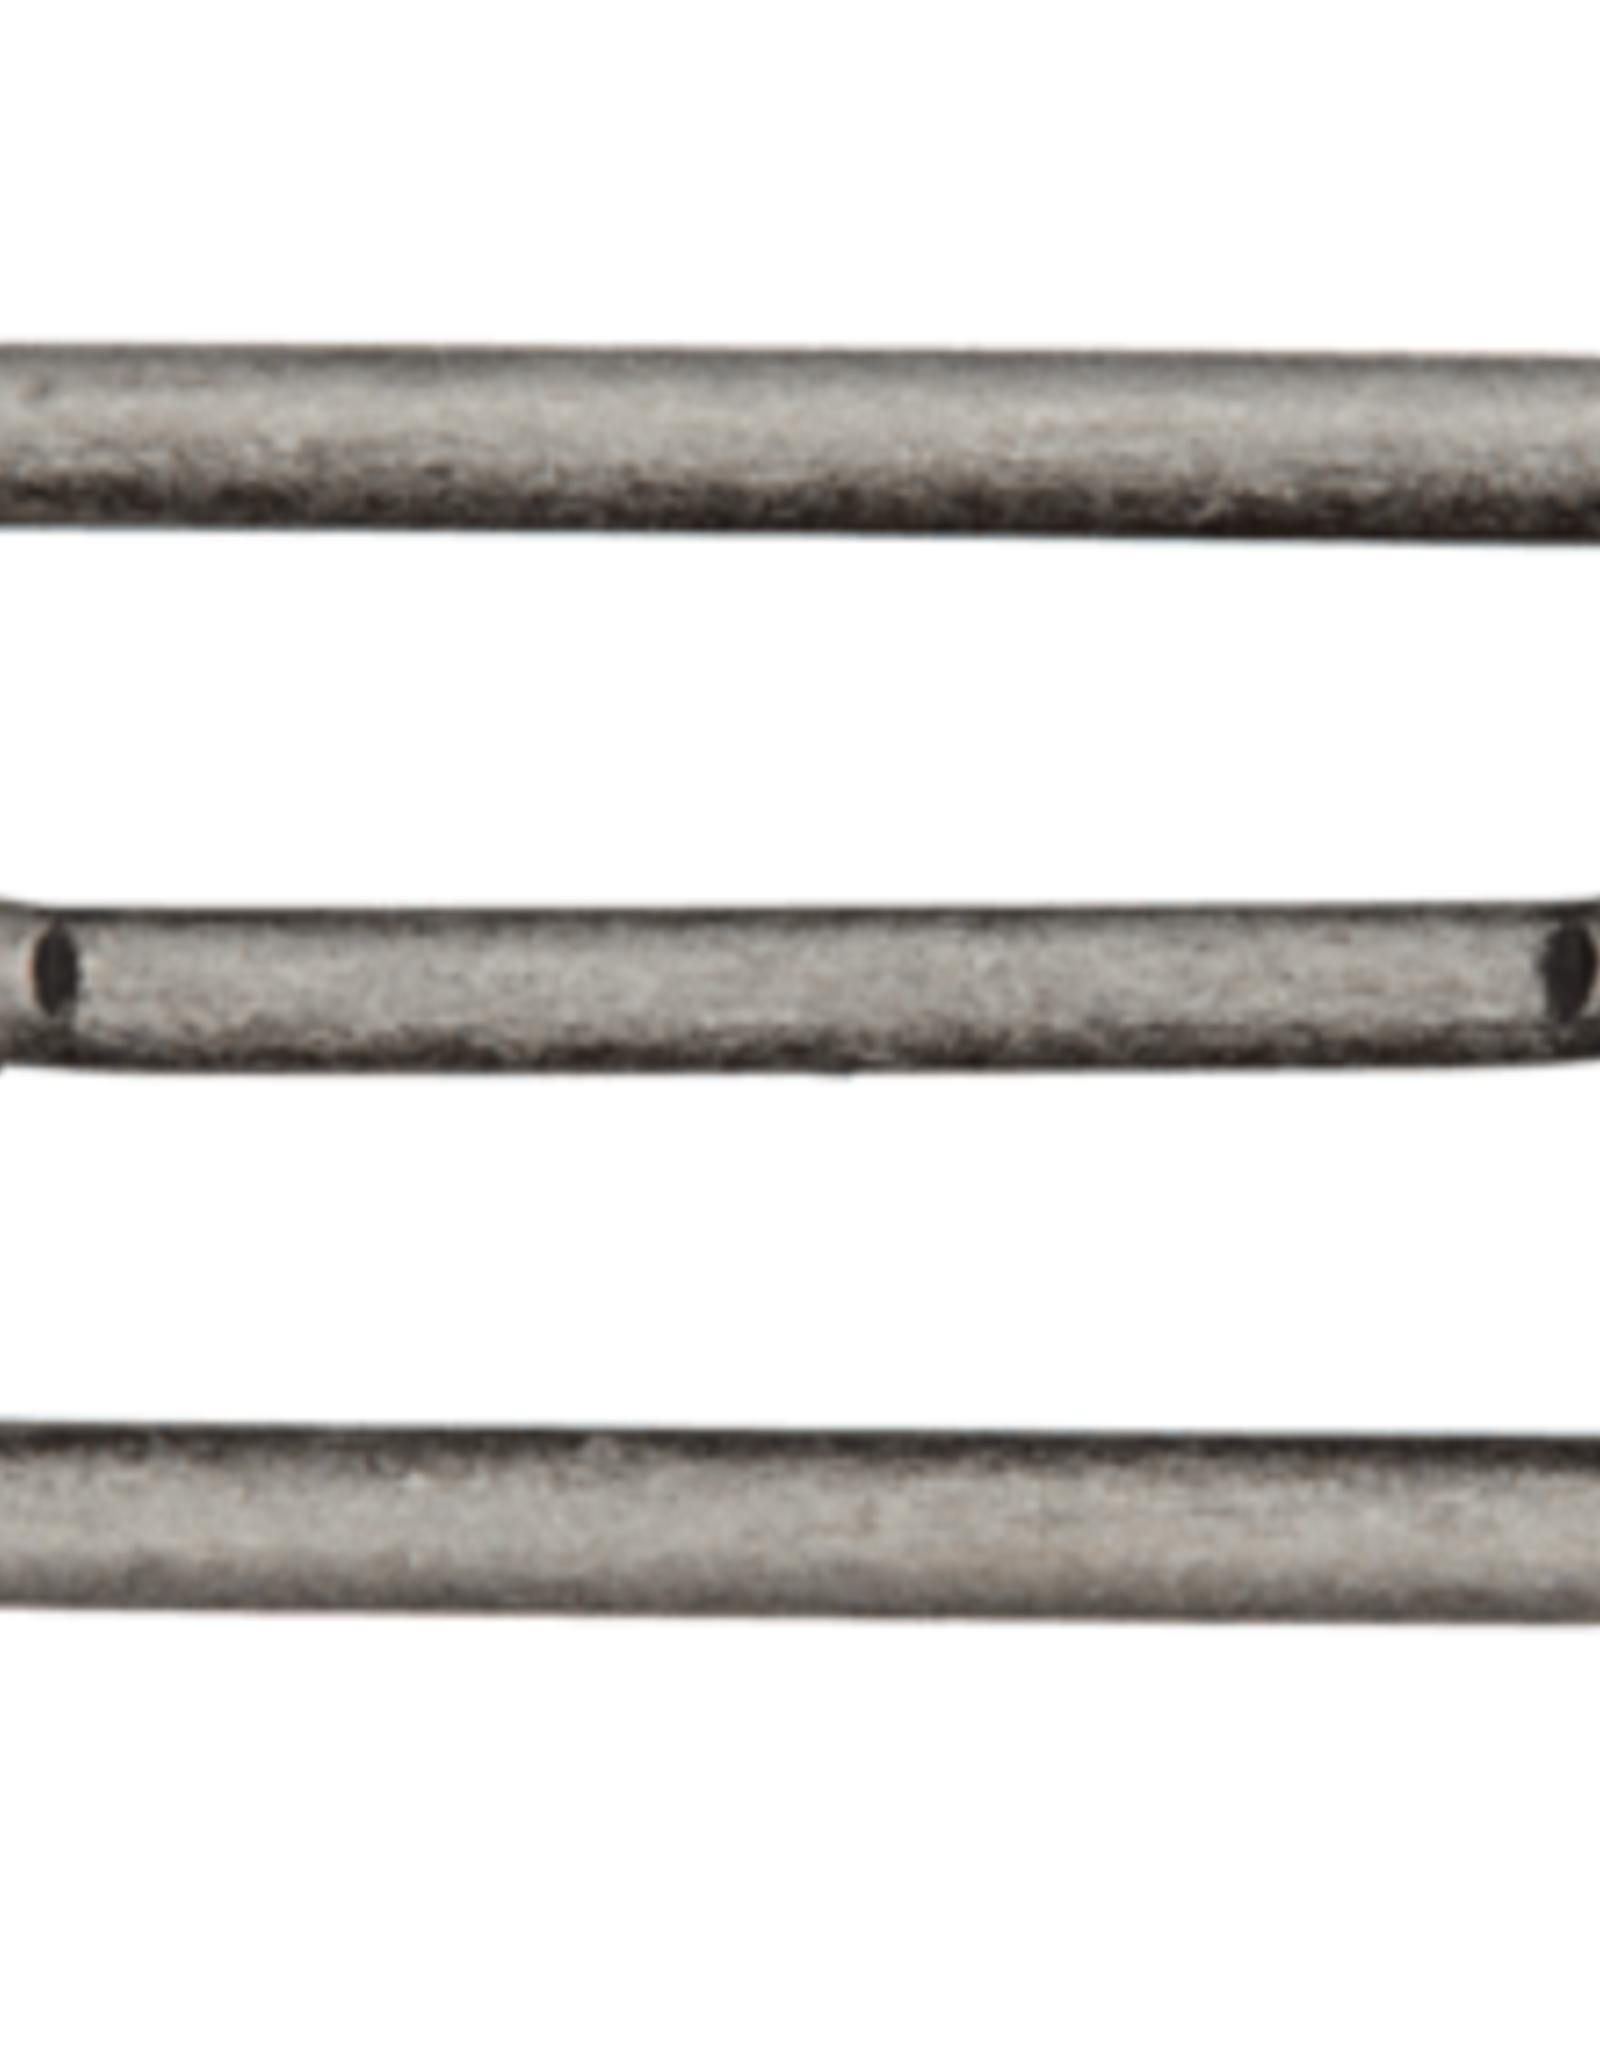 Schuifgesp 30mm - Grijs